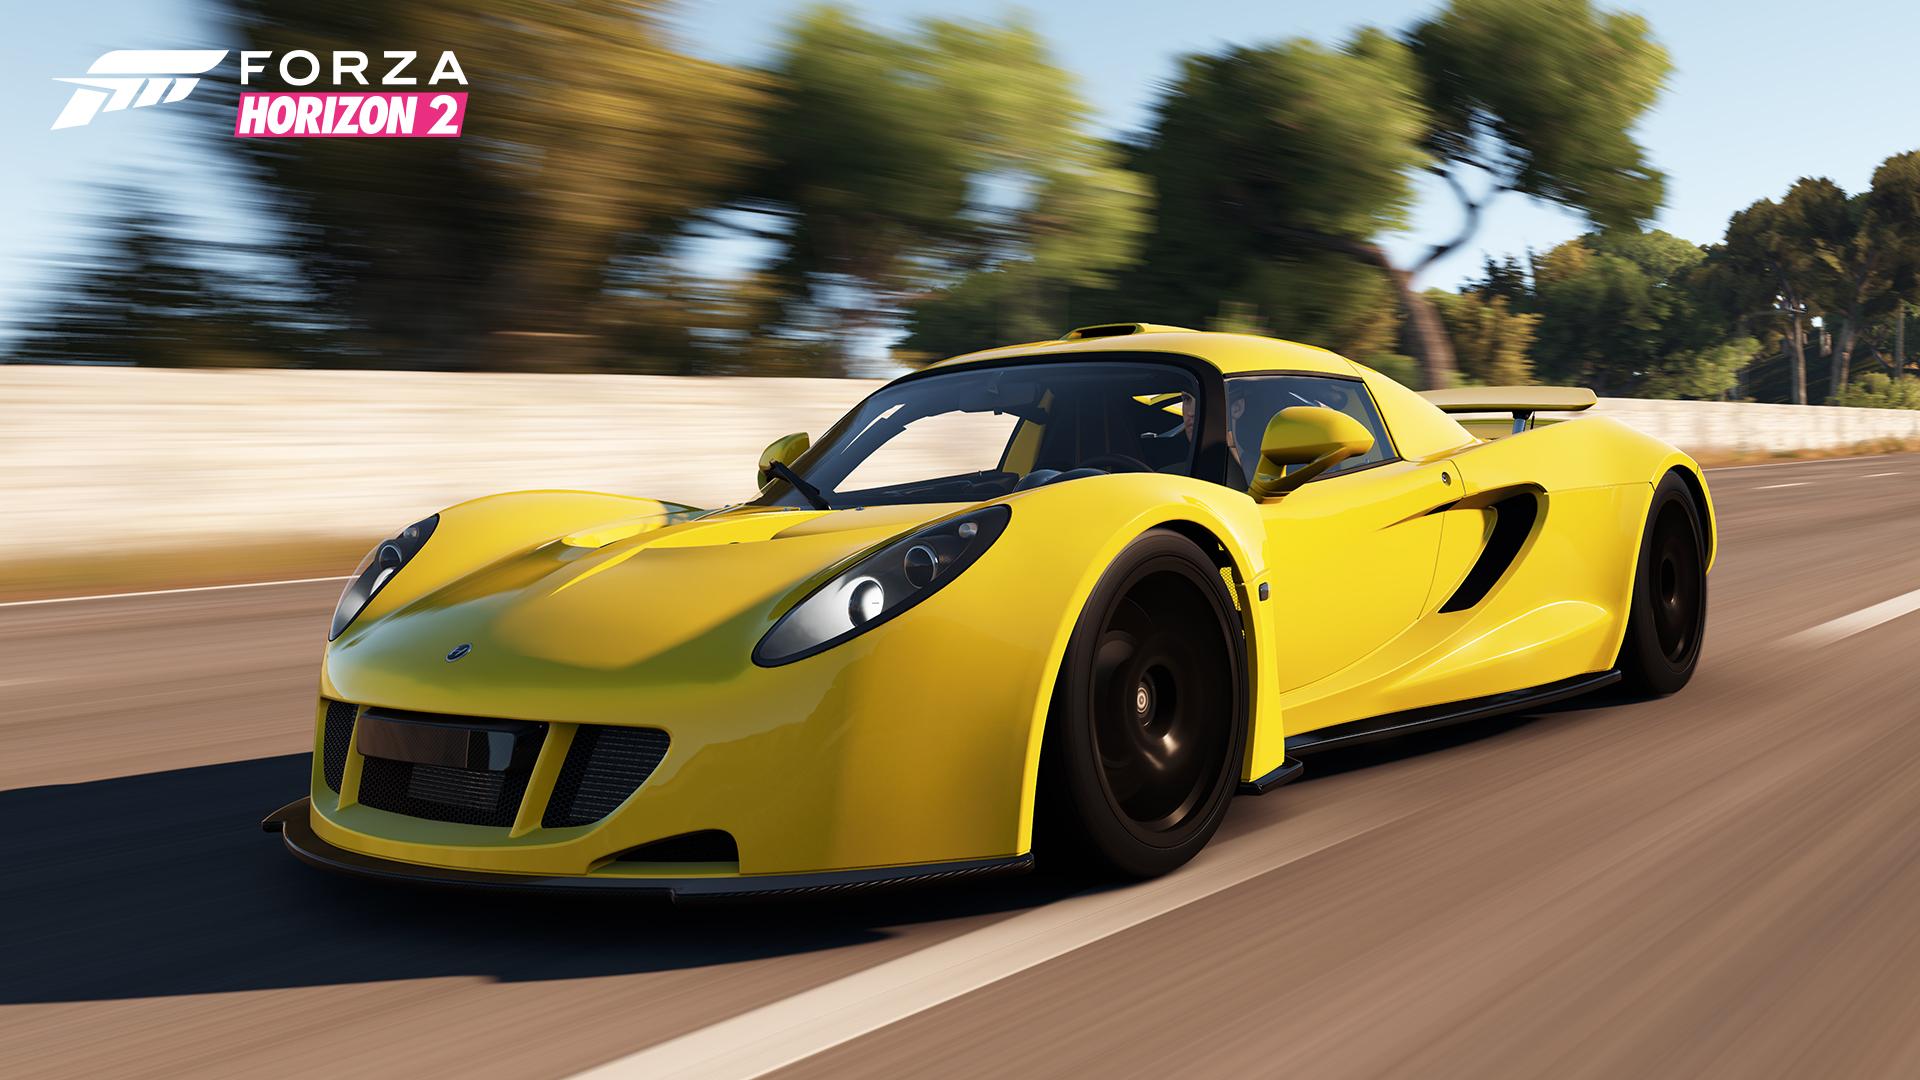 Forza Horizon 2 Revelados 15 Autom 243 Viles Nuevos El Dojo Gamer